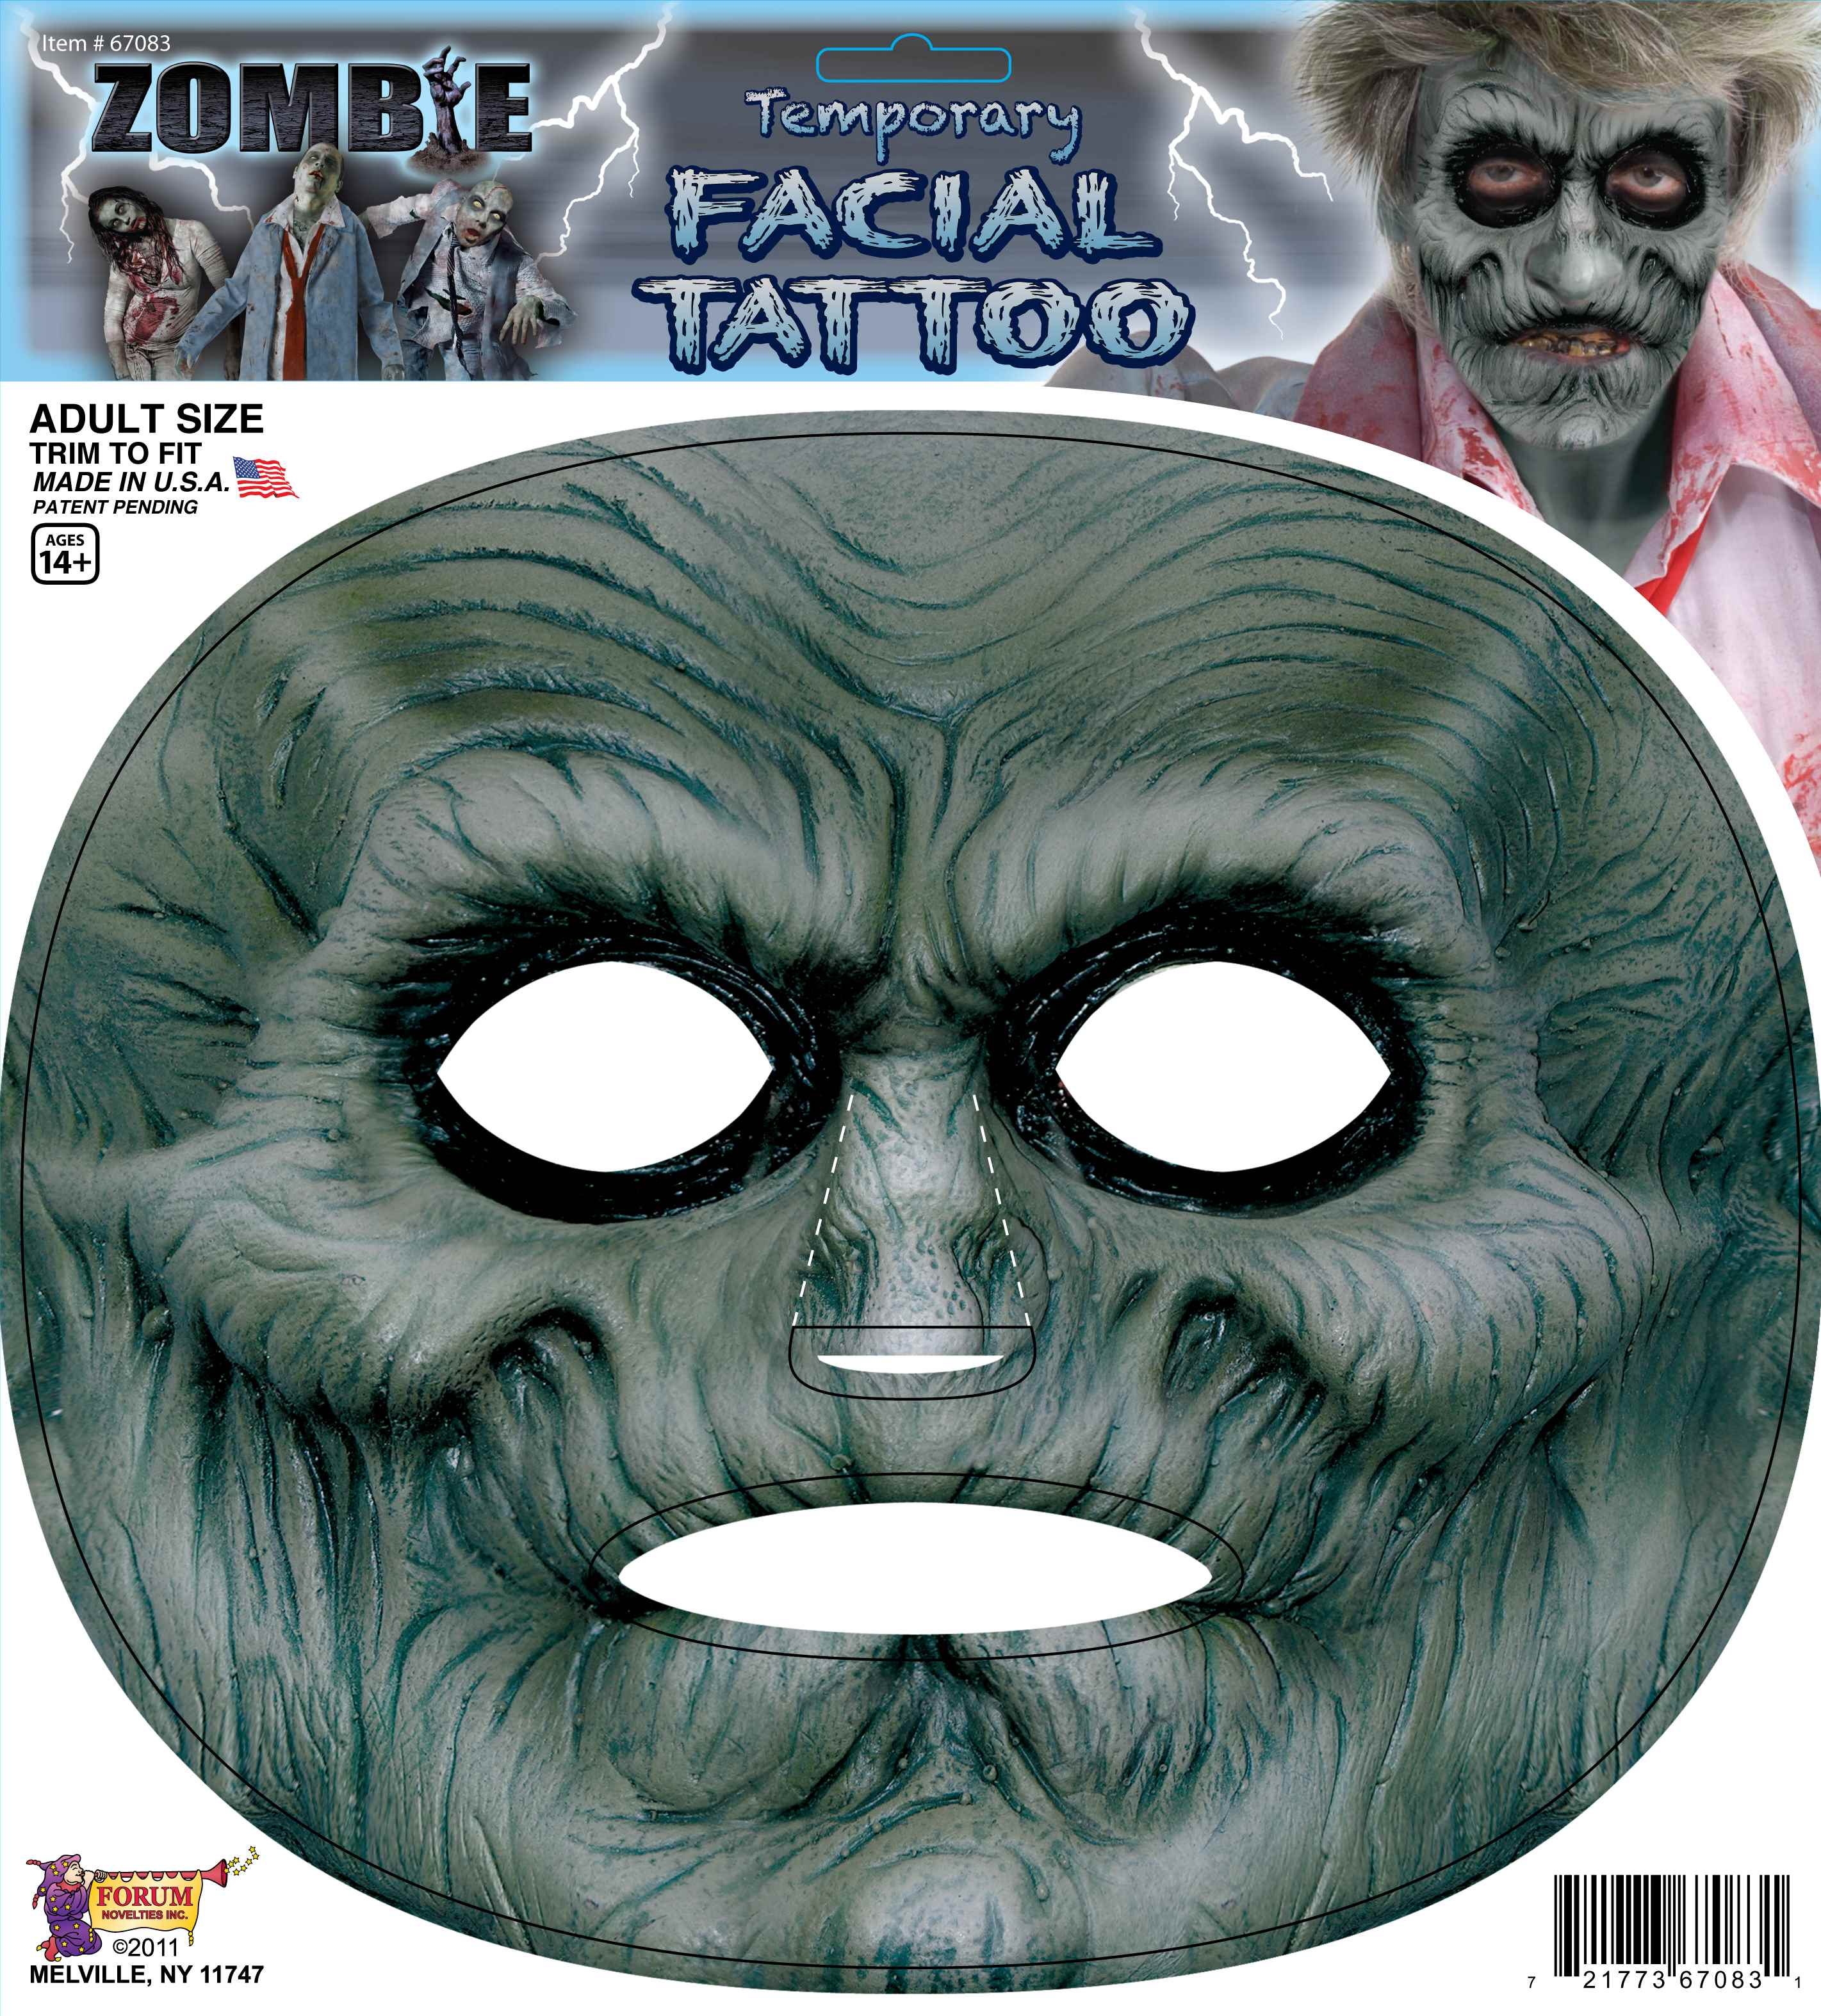 Zombie Temporary Facial Tattoo Costume Accessory